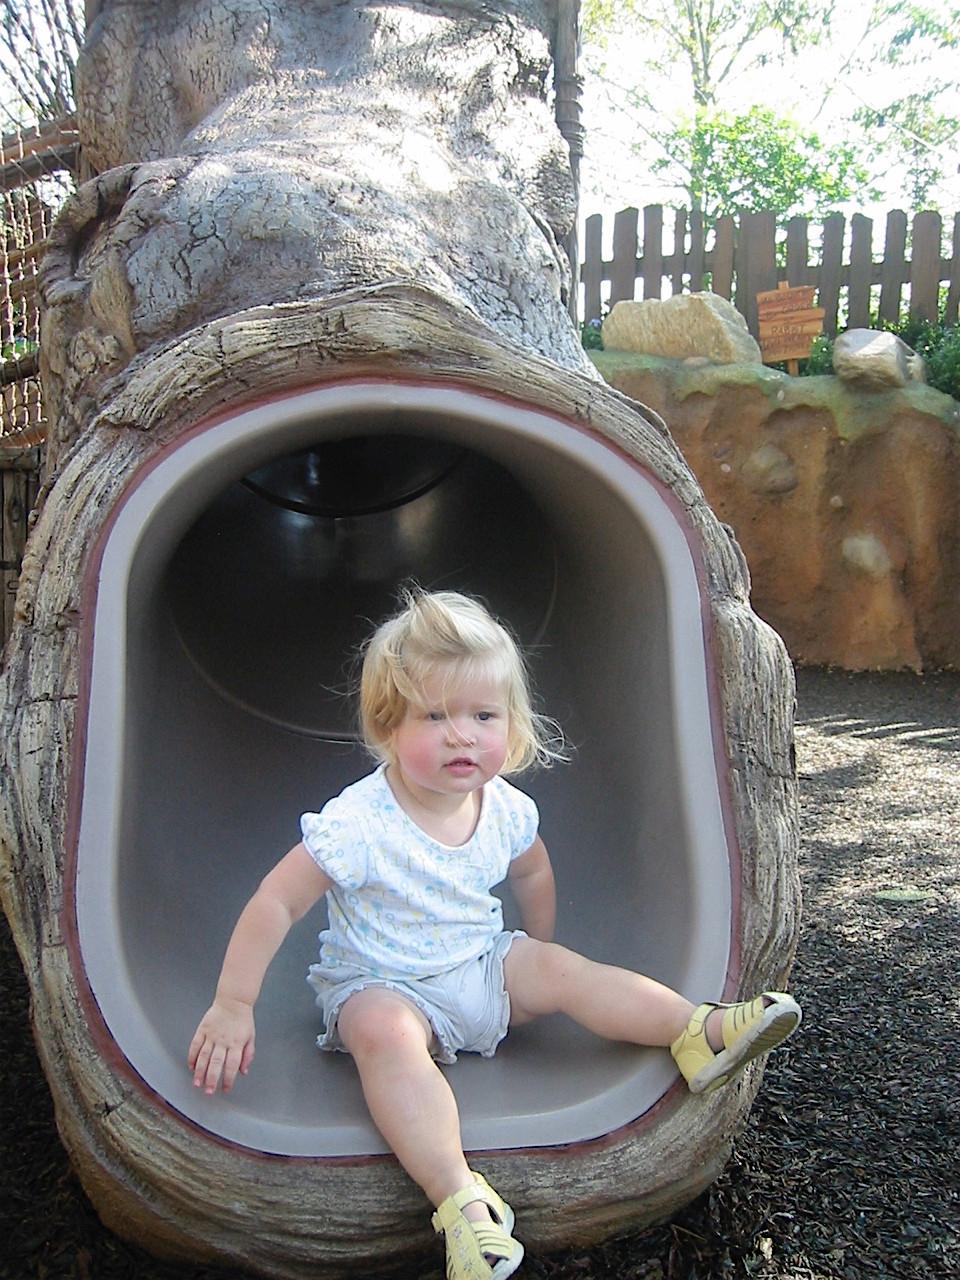 The Winnie the Pooh playground